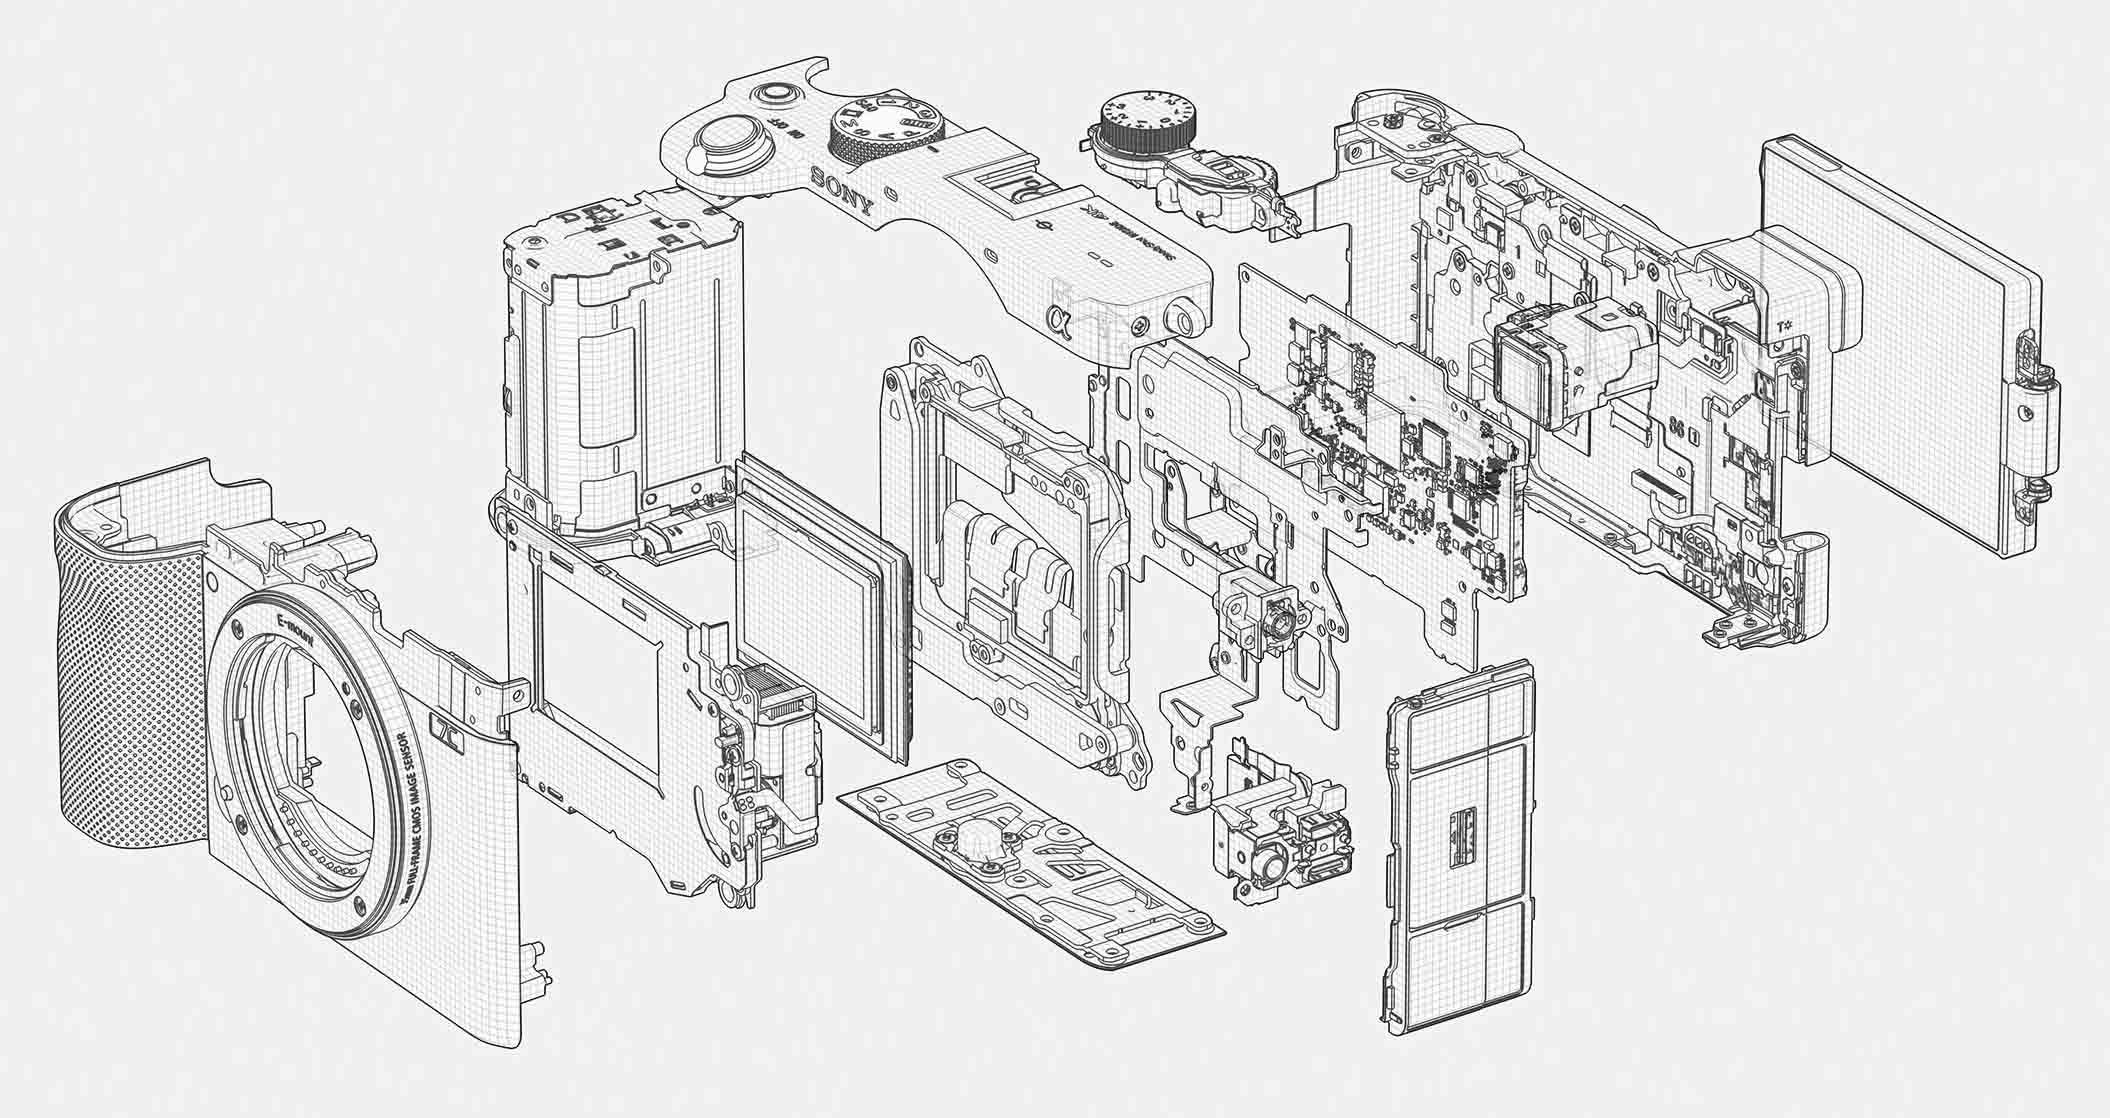 Sony A7C kit (ILCE-7CL/S)